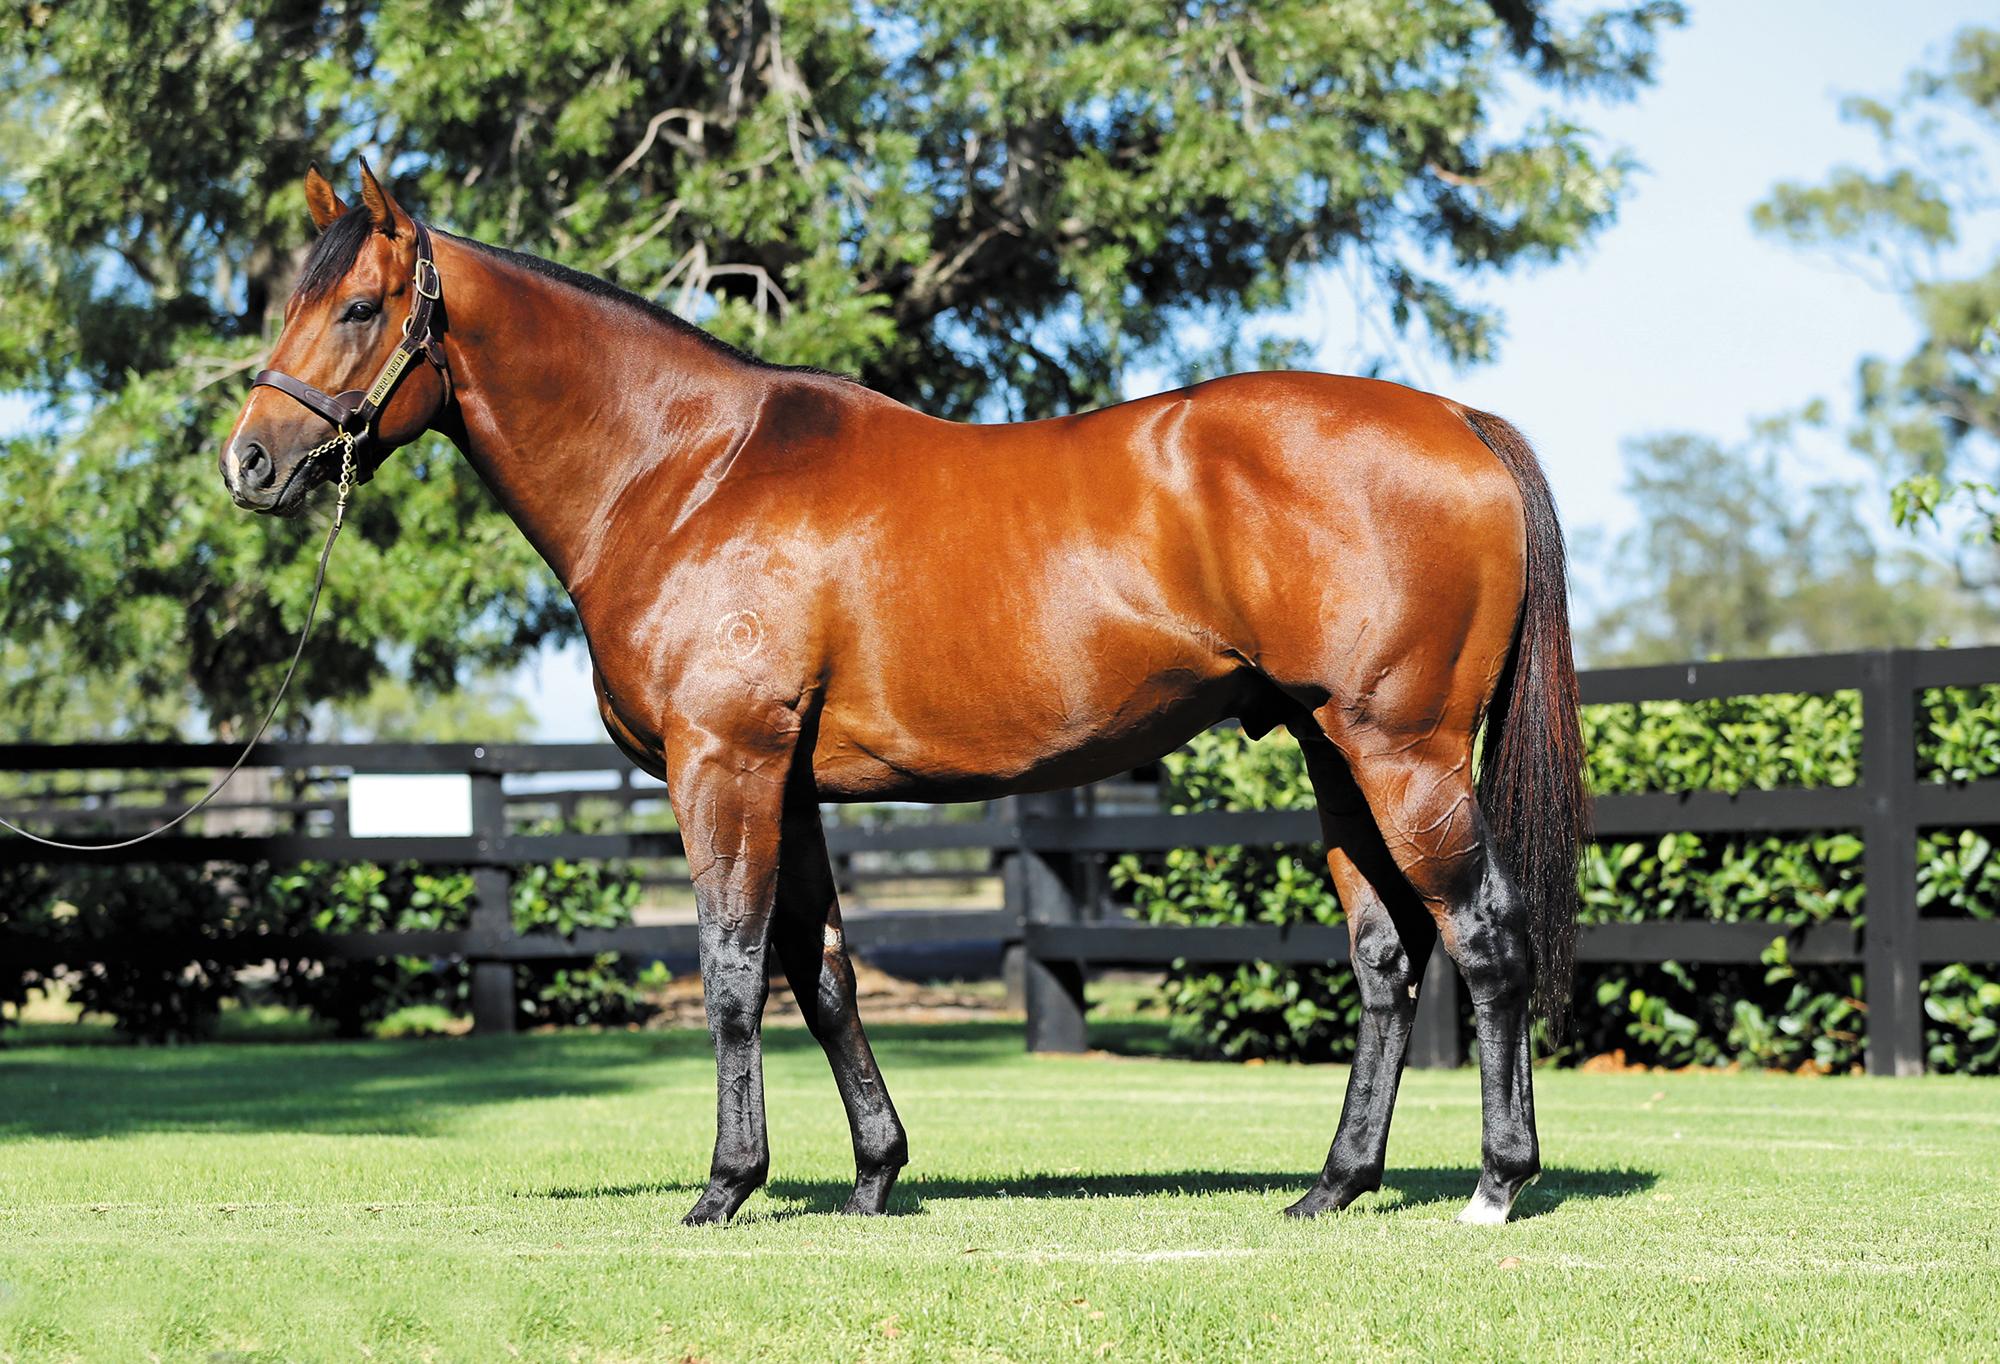 https://www.stallions.com.au/wp-content/uploads/2019/09/103947713.jpg